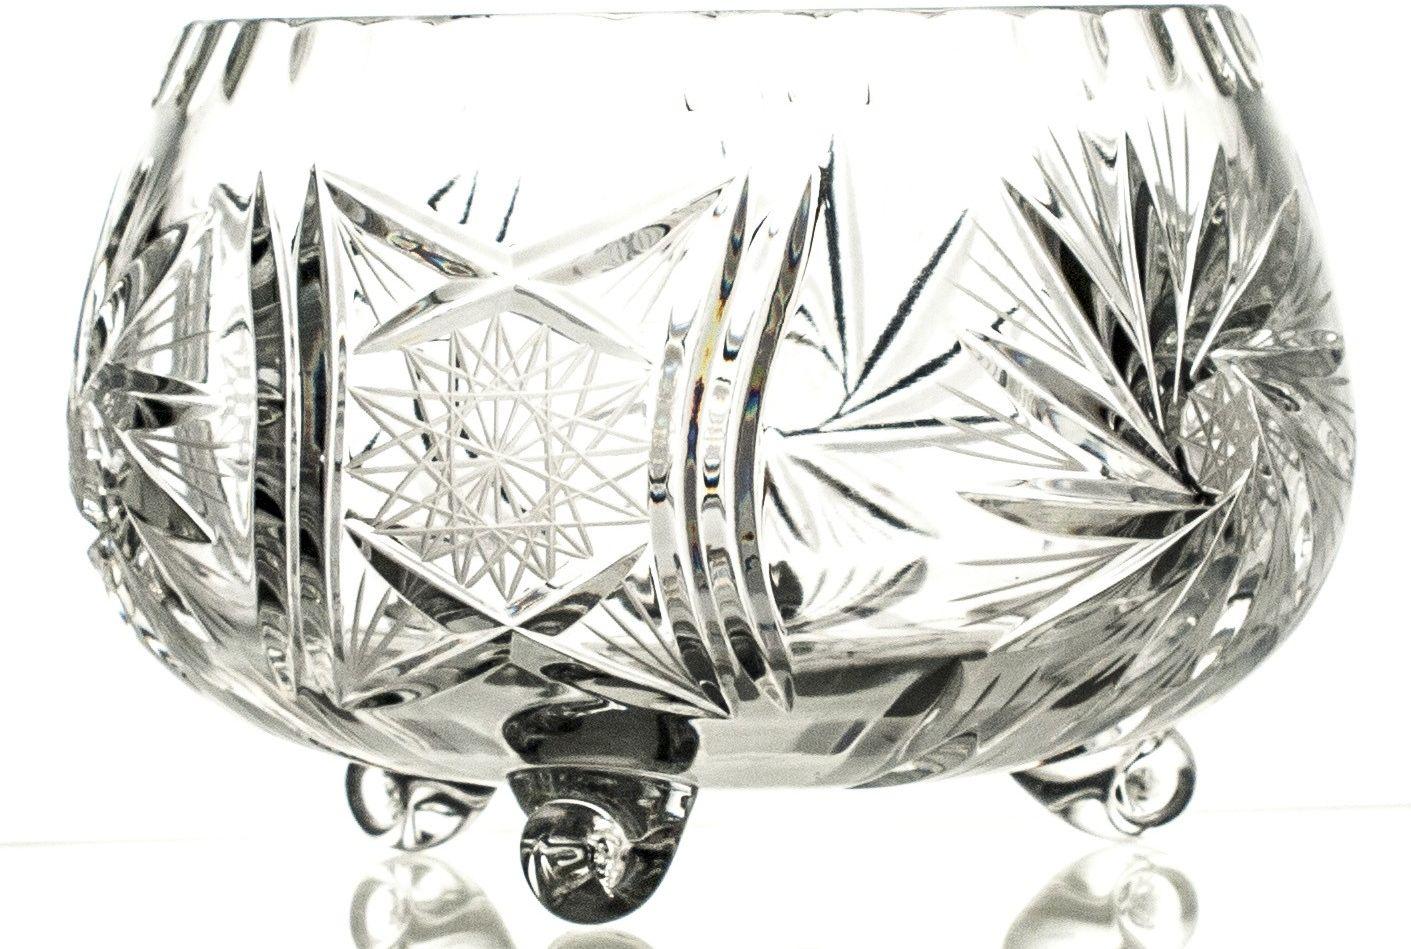 Owocarka kryształowa (13350)